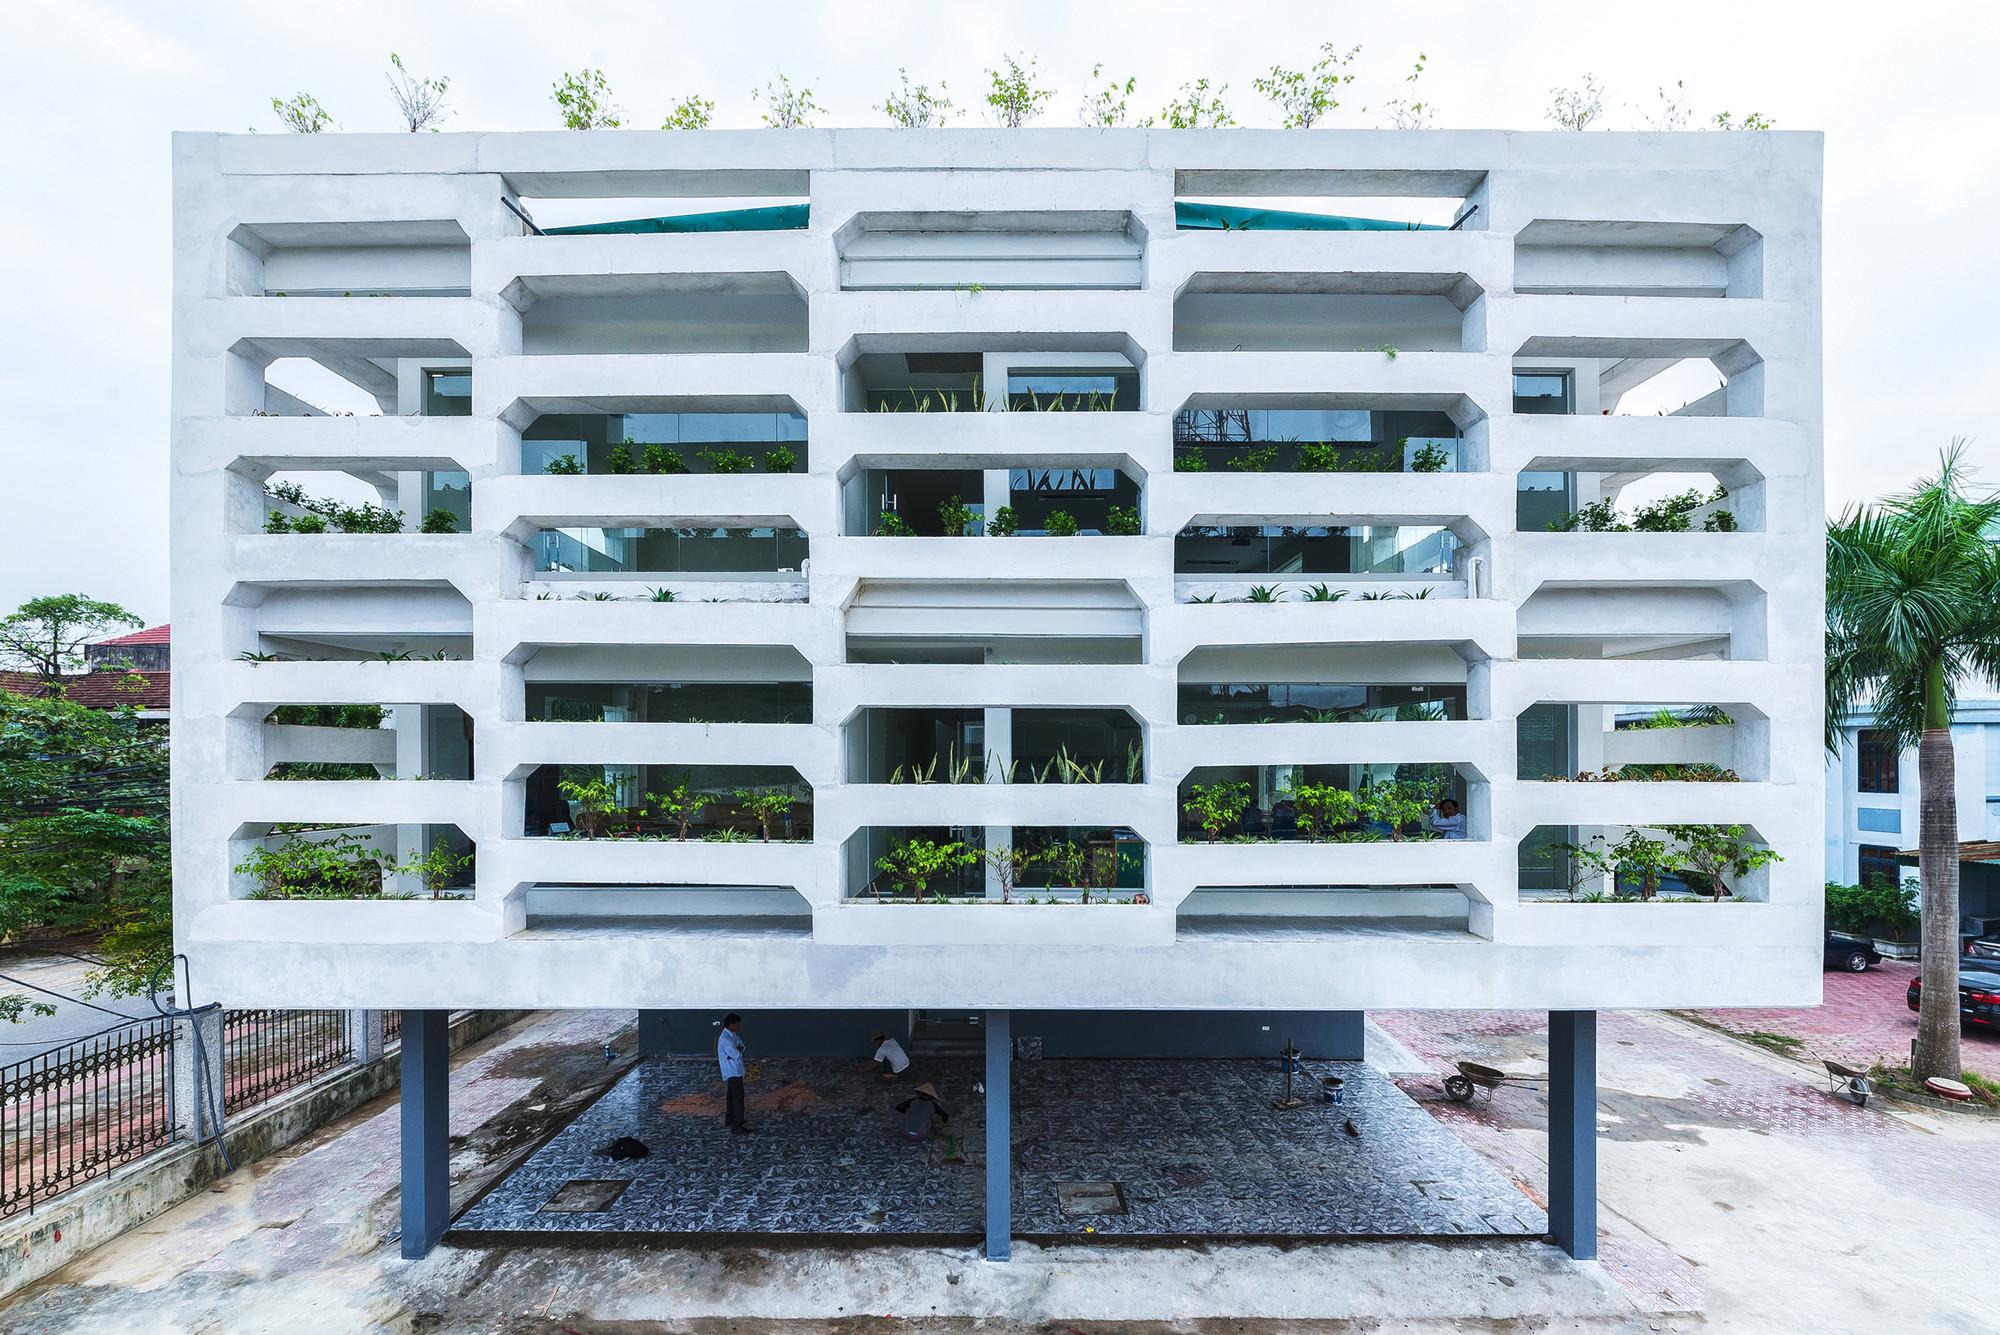 Oficina SRDP-IWMC / H&P Architects, © Nguyen Tien Thanh.